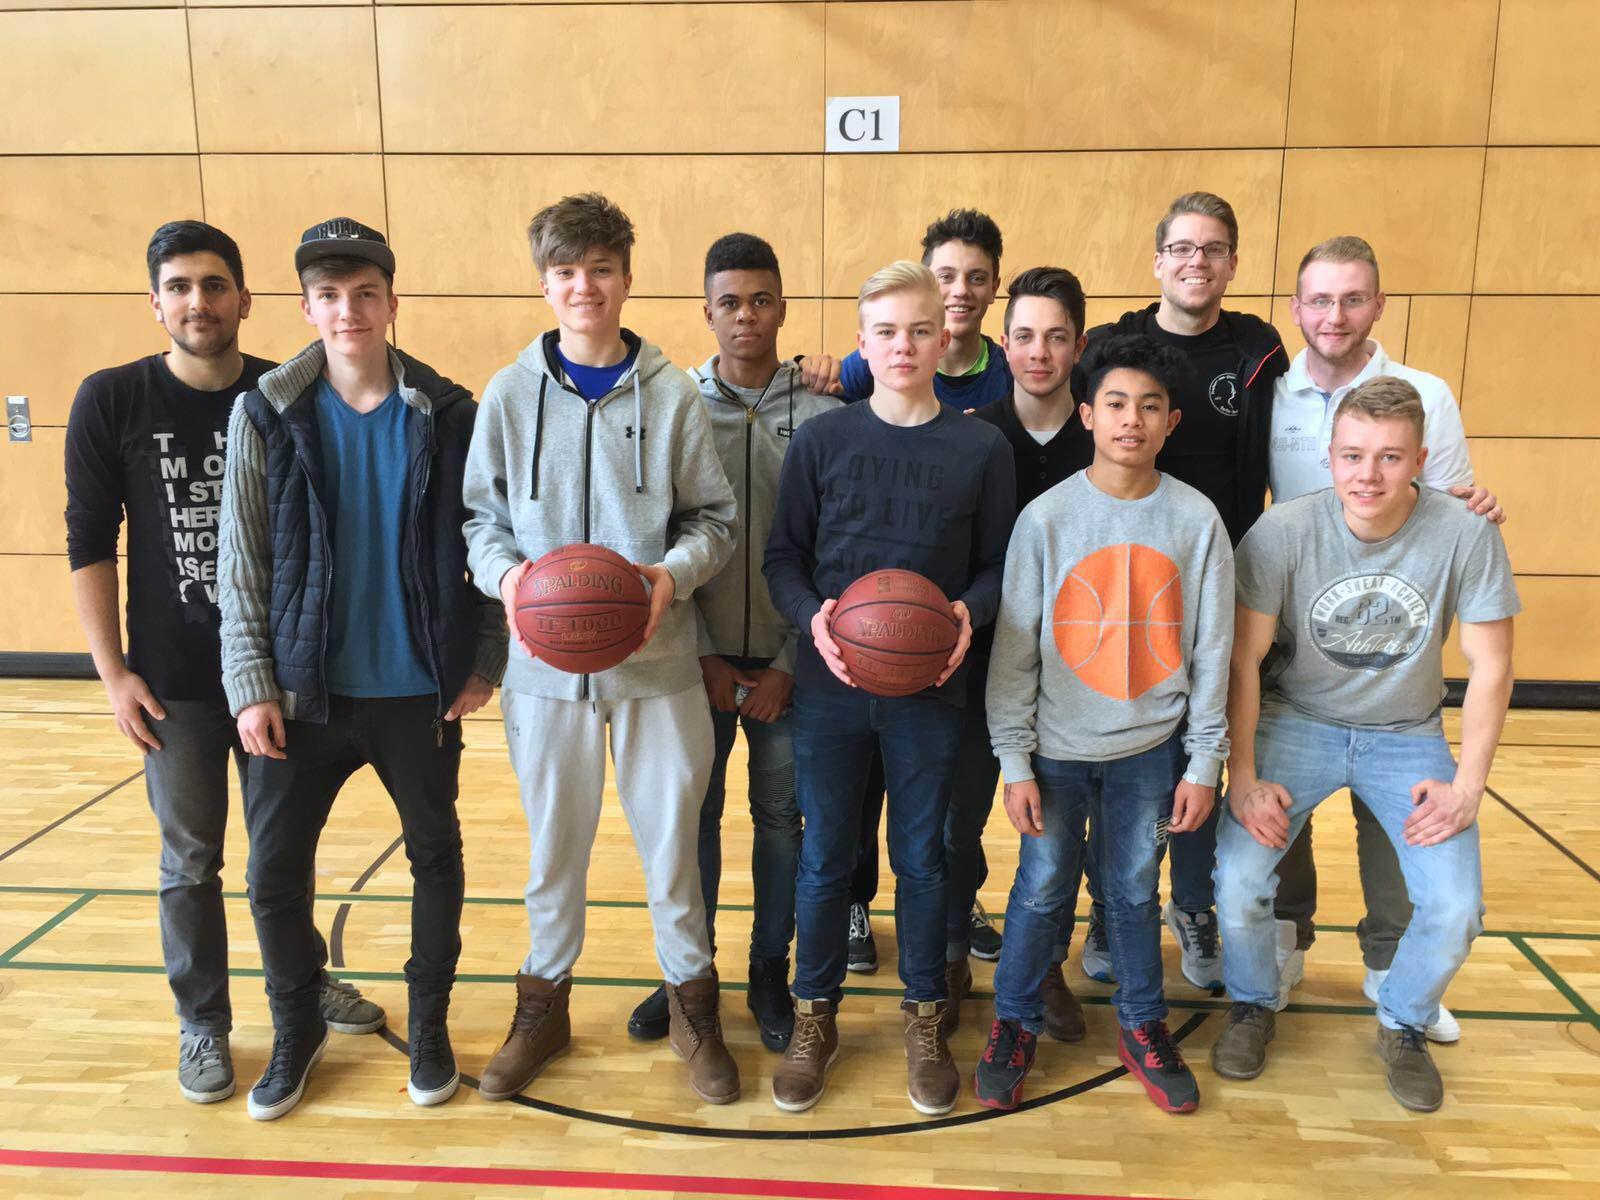 http://www.steingymnasium.de/wp-content/uploads/2016/03/basketball2016.jpg